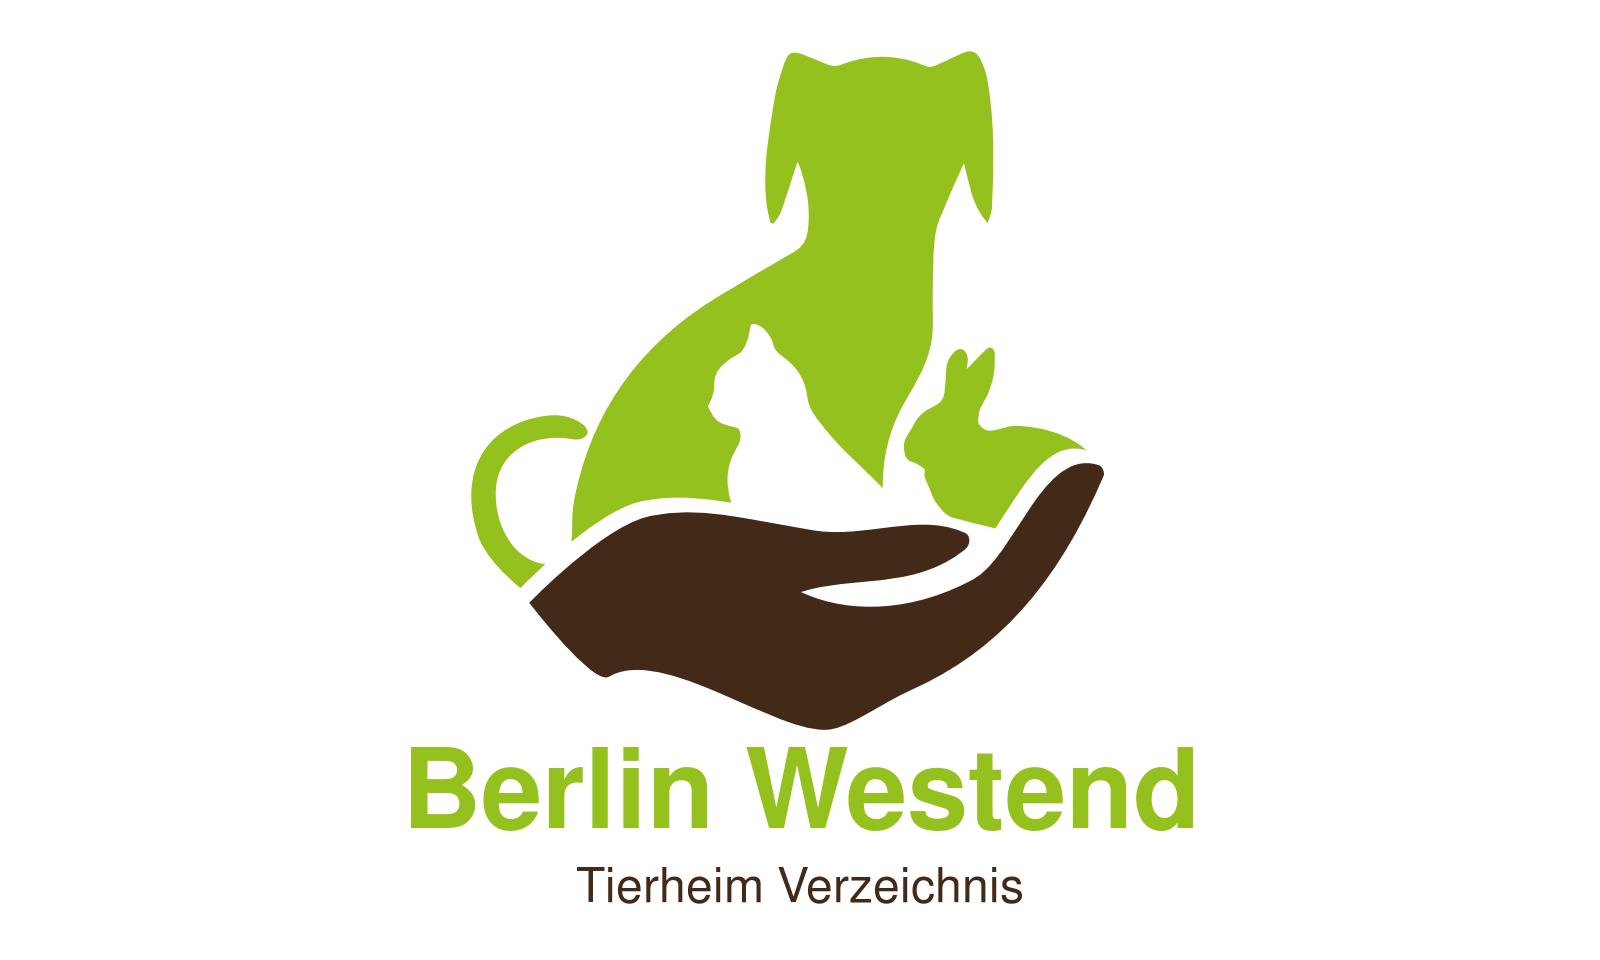 Tierheim Berlin Westend